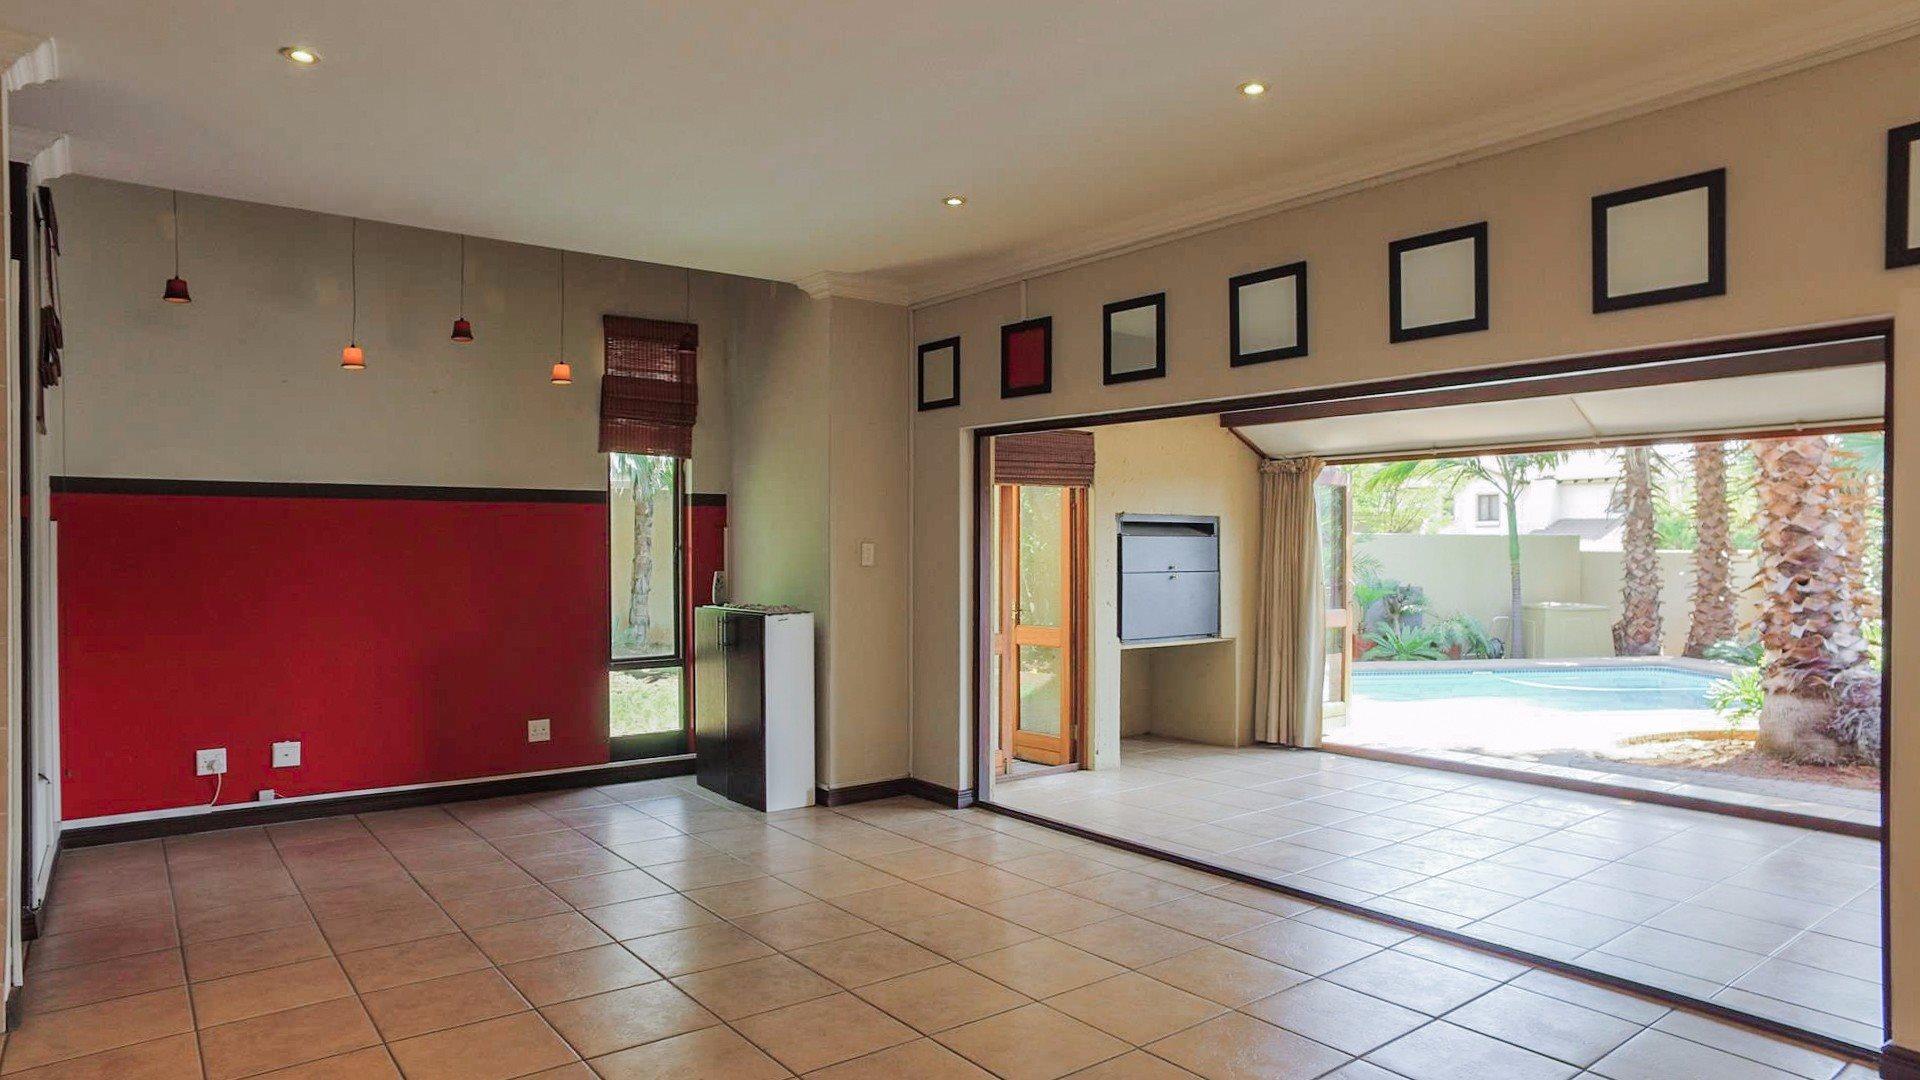 Irene View Estate property for sale. Ref No: 13519995. Picture no 4